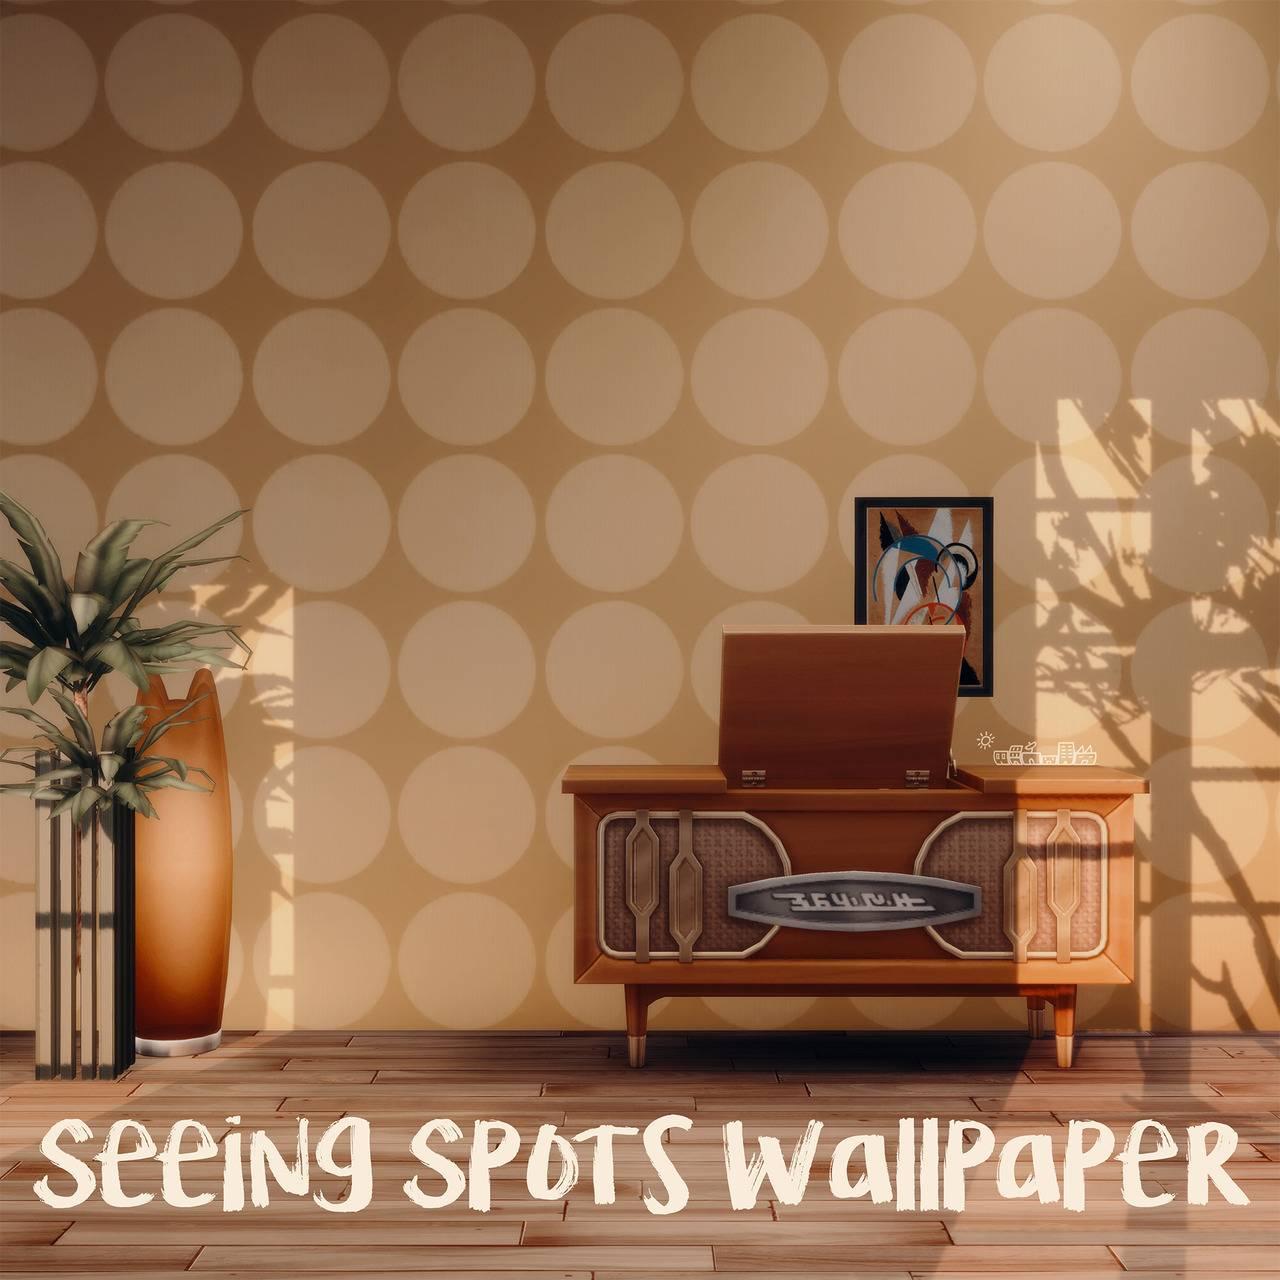 Обои - SEEING SPOTS WALLPAPER